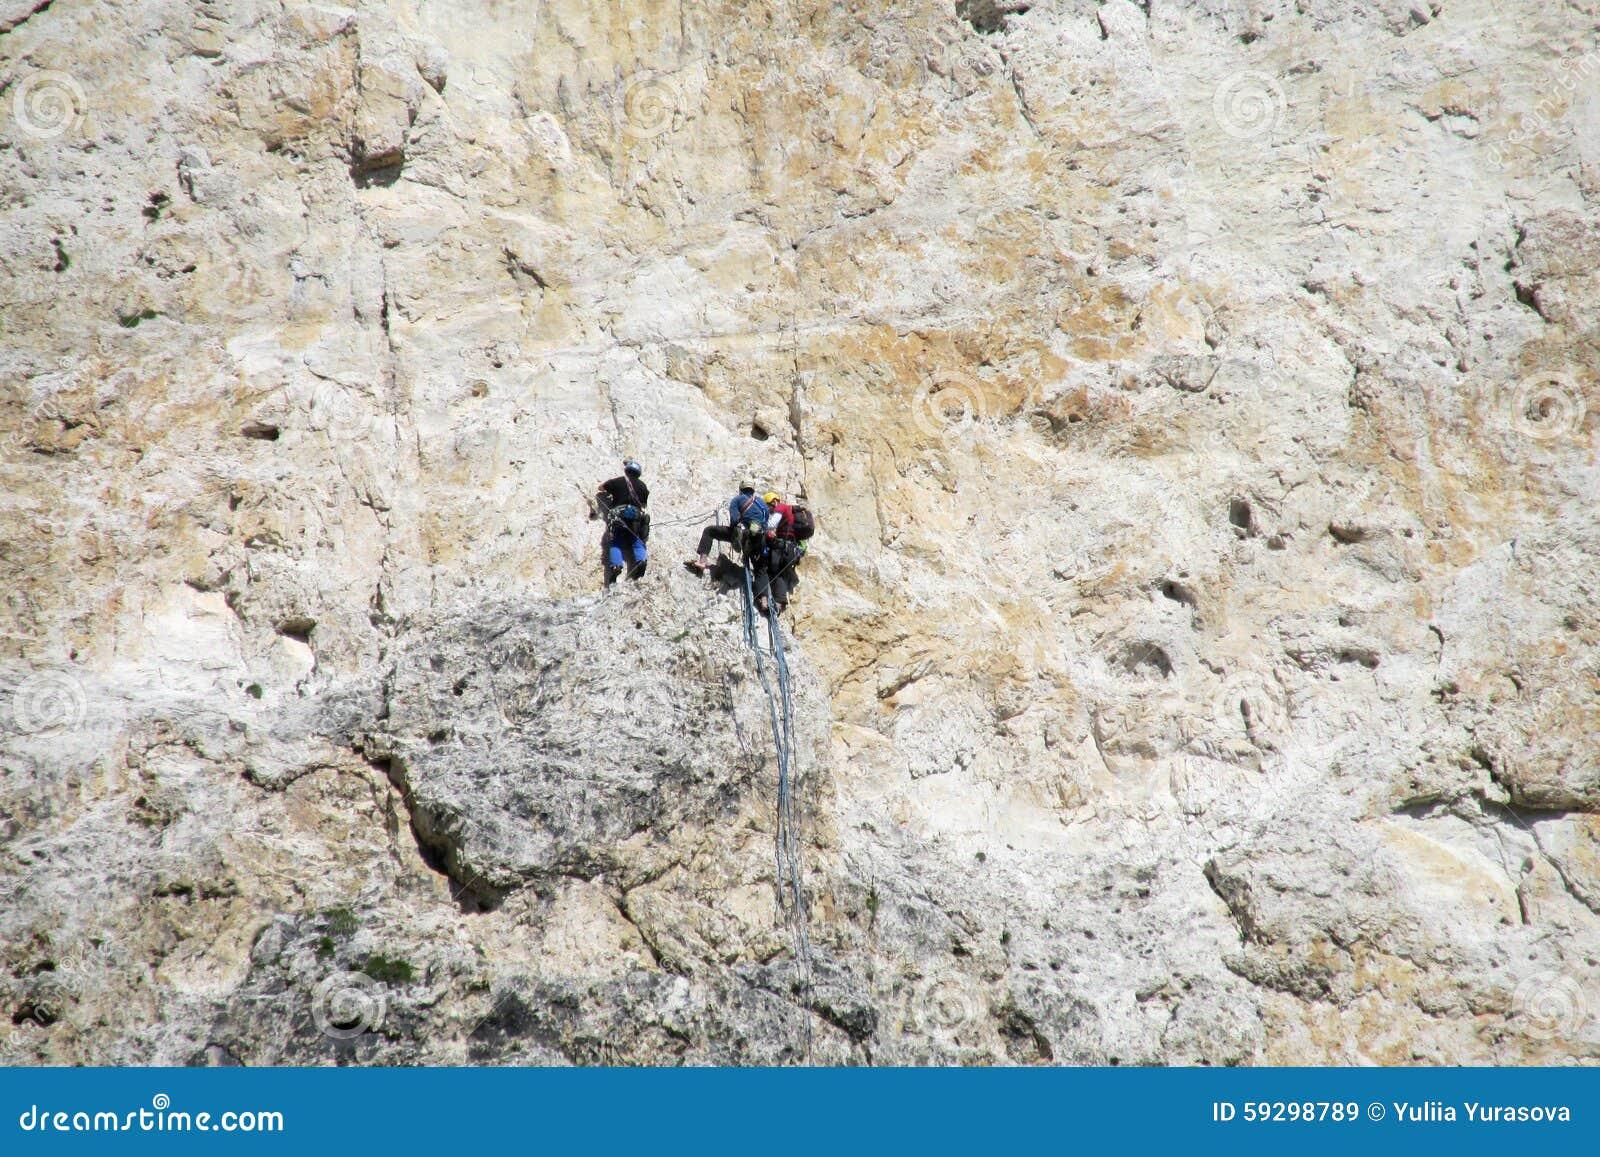 Climbers on mountain wall